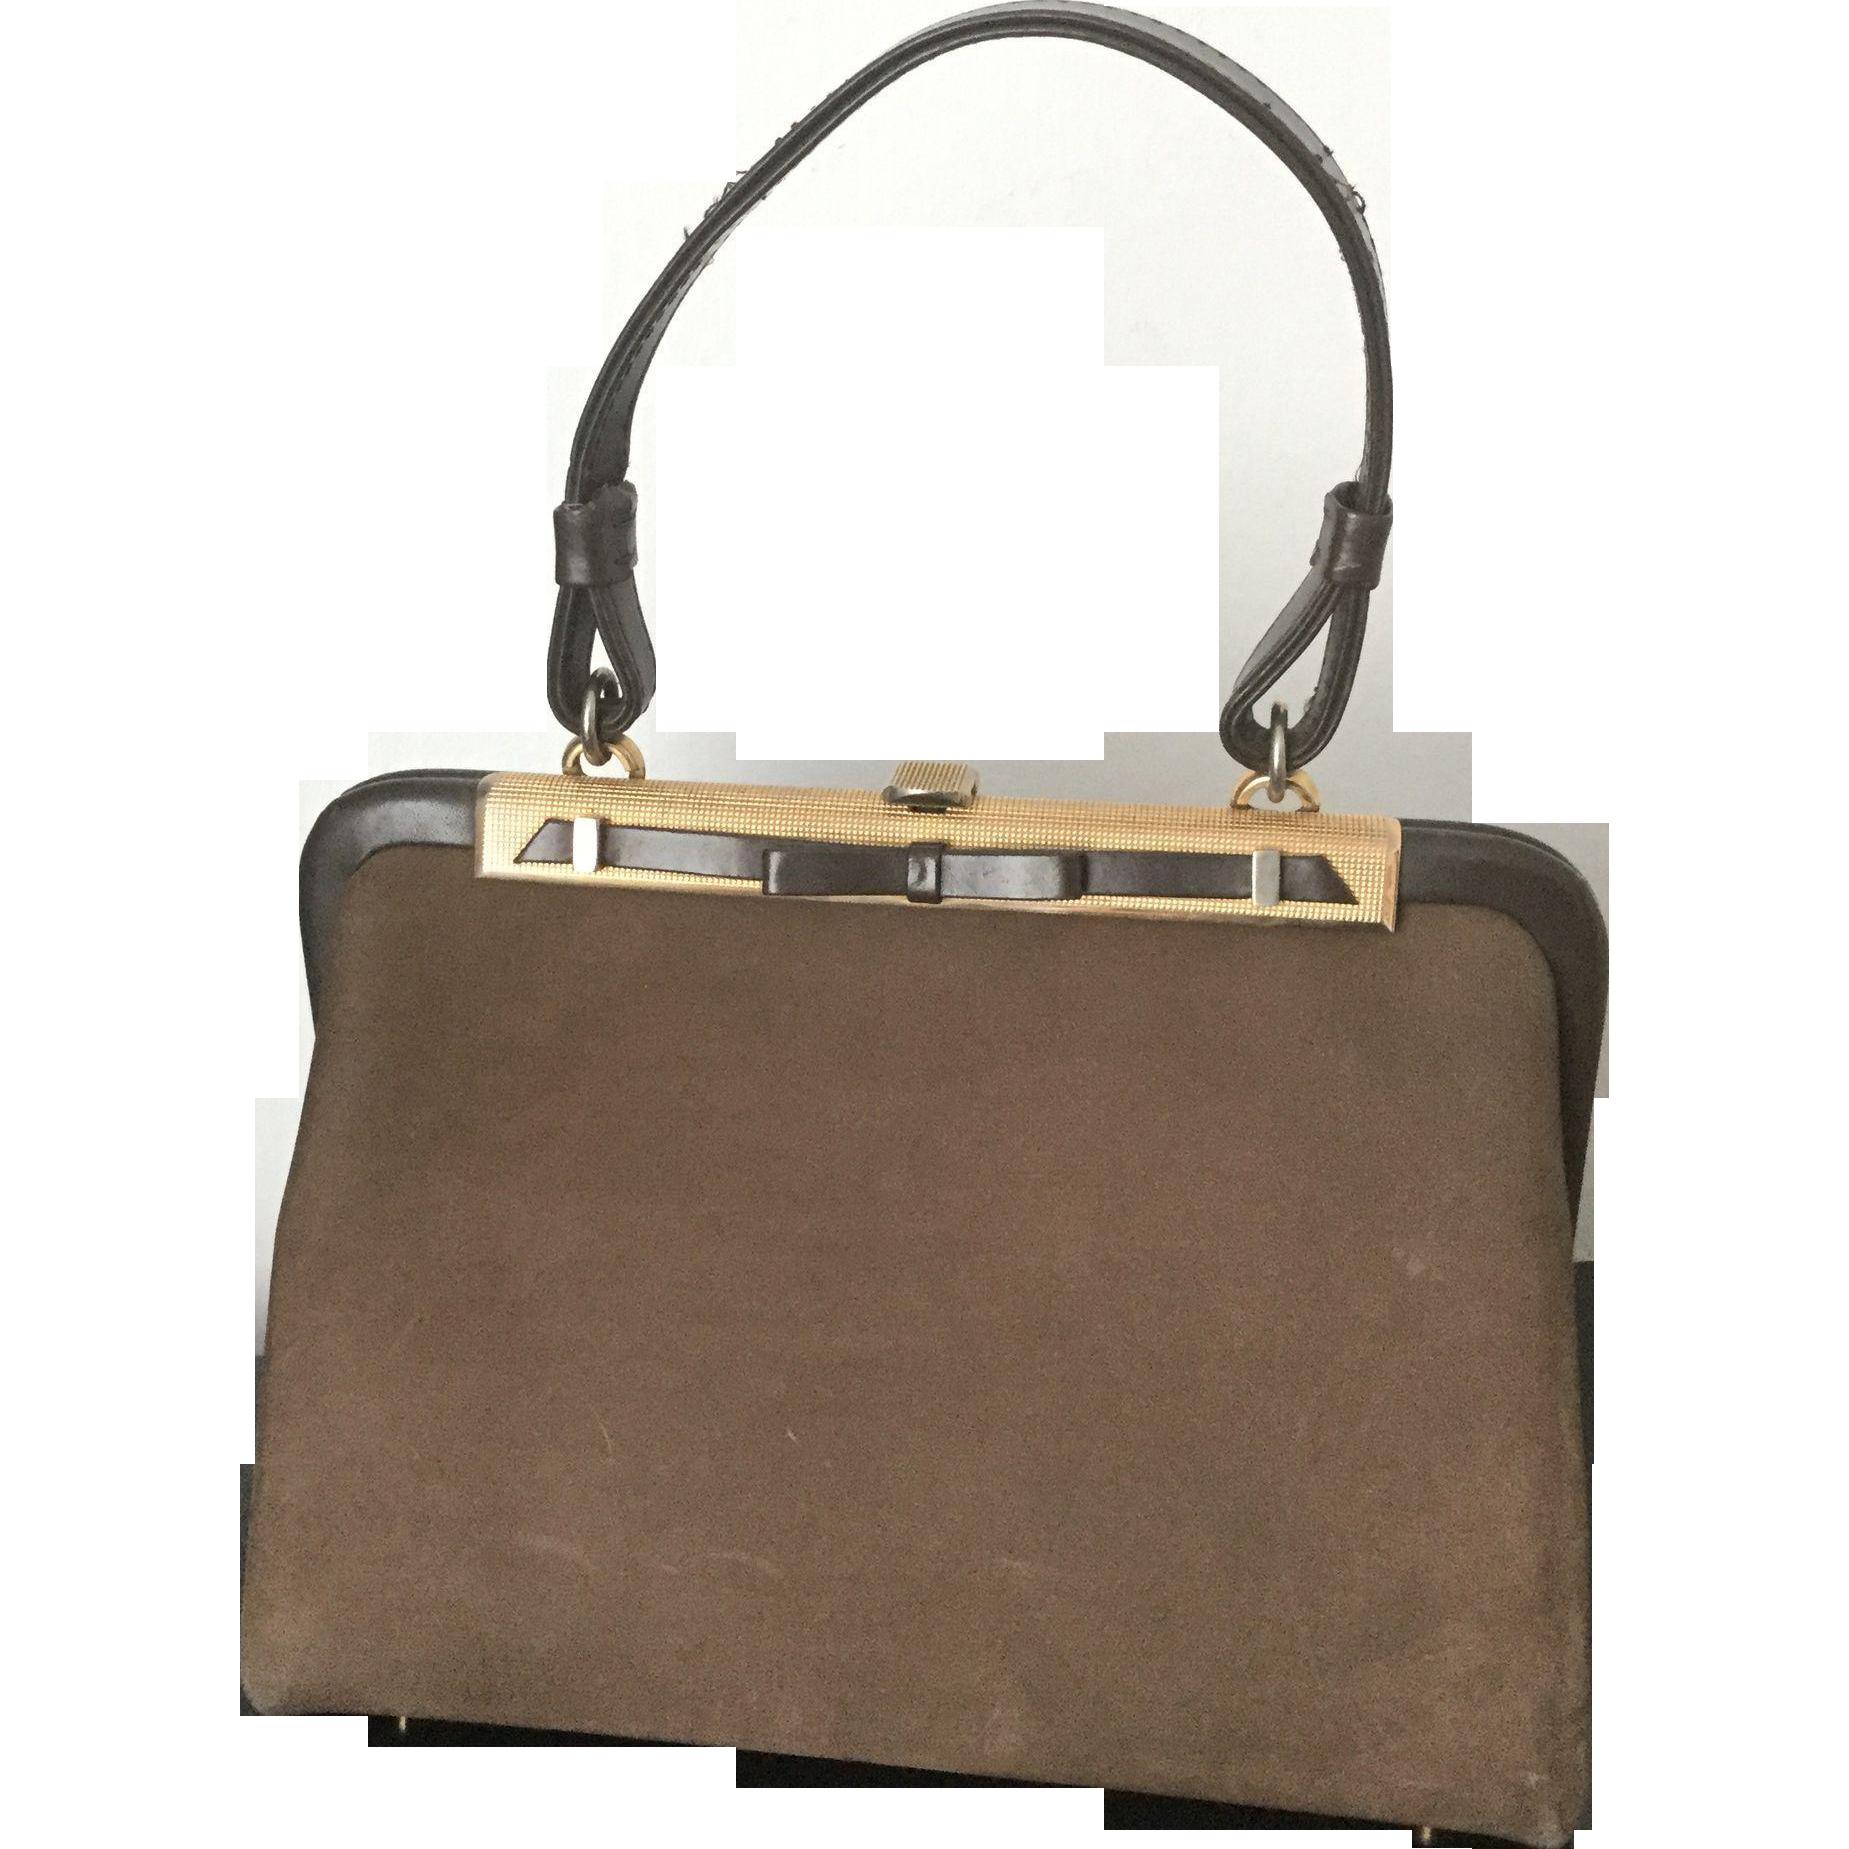 Rare Haute Couture LOEWE Paris Vintage Brown Nubuck Luxury Handbag 1950 circa